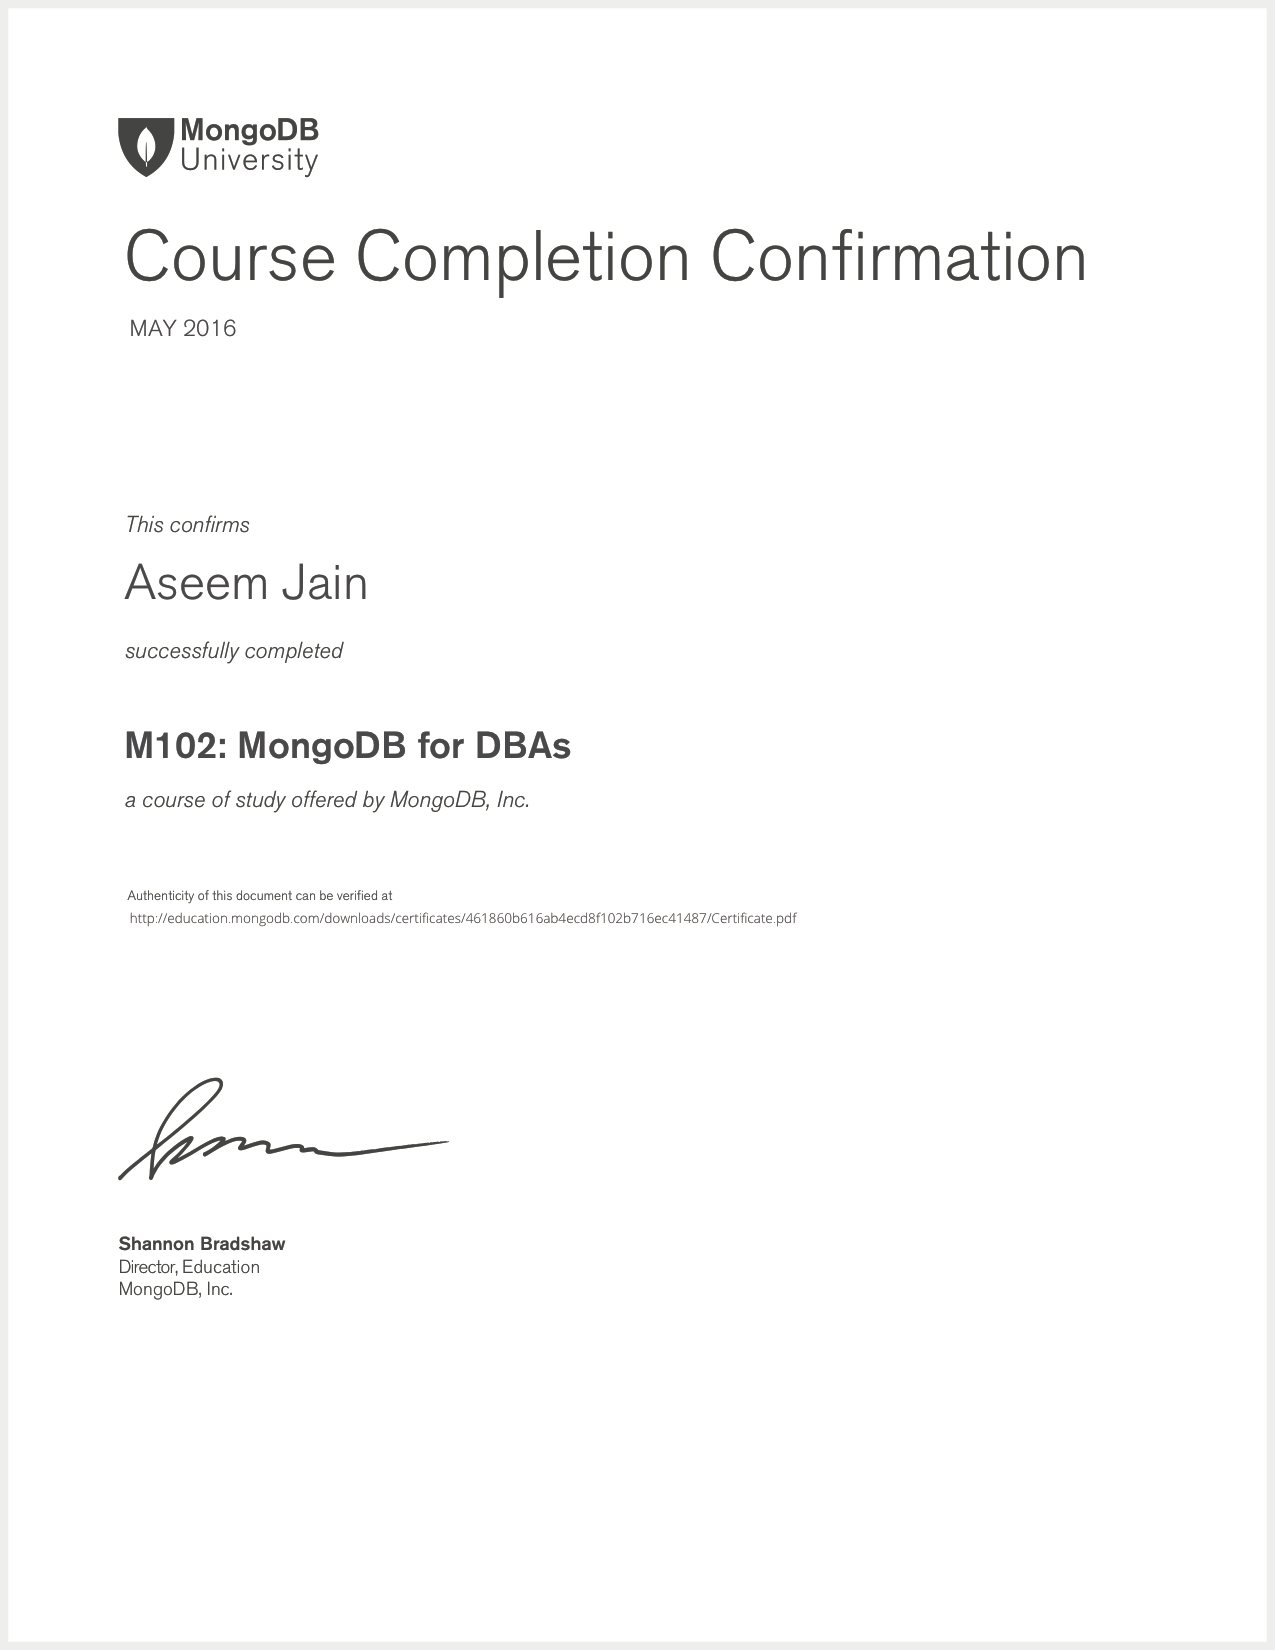 https://premaseem wordpress com/2019/08/30/certificate